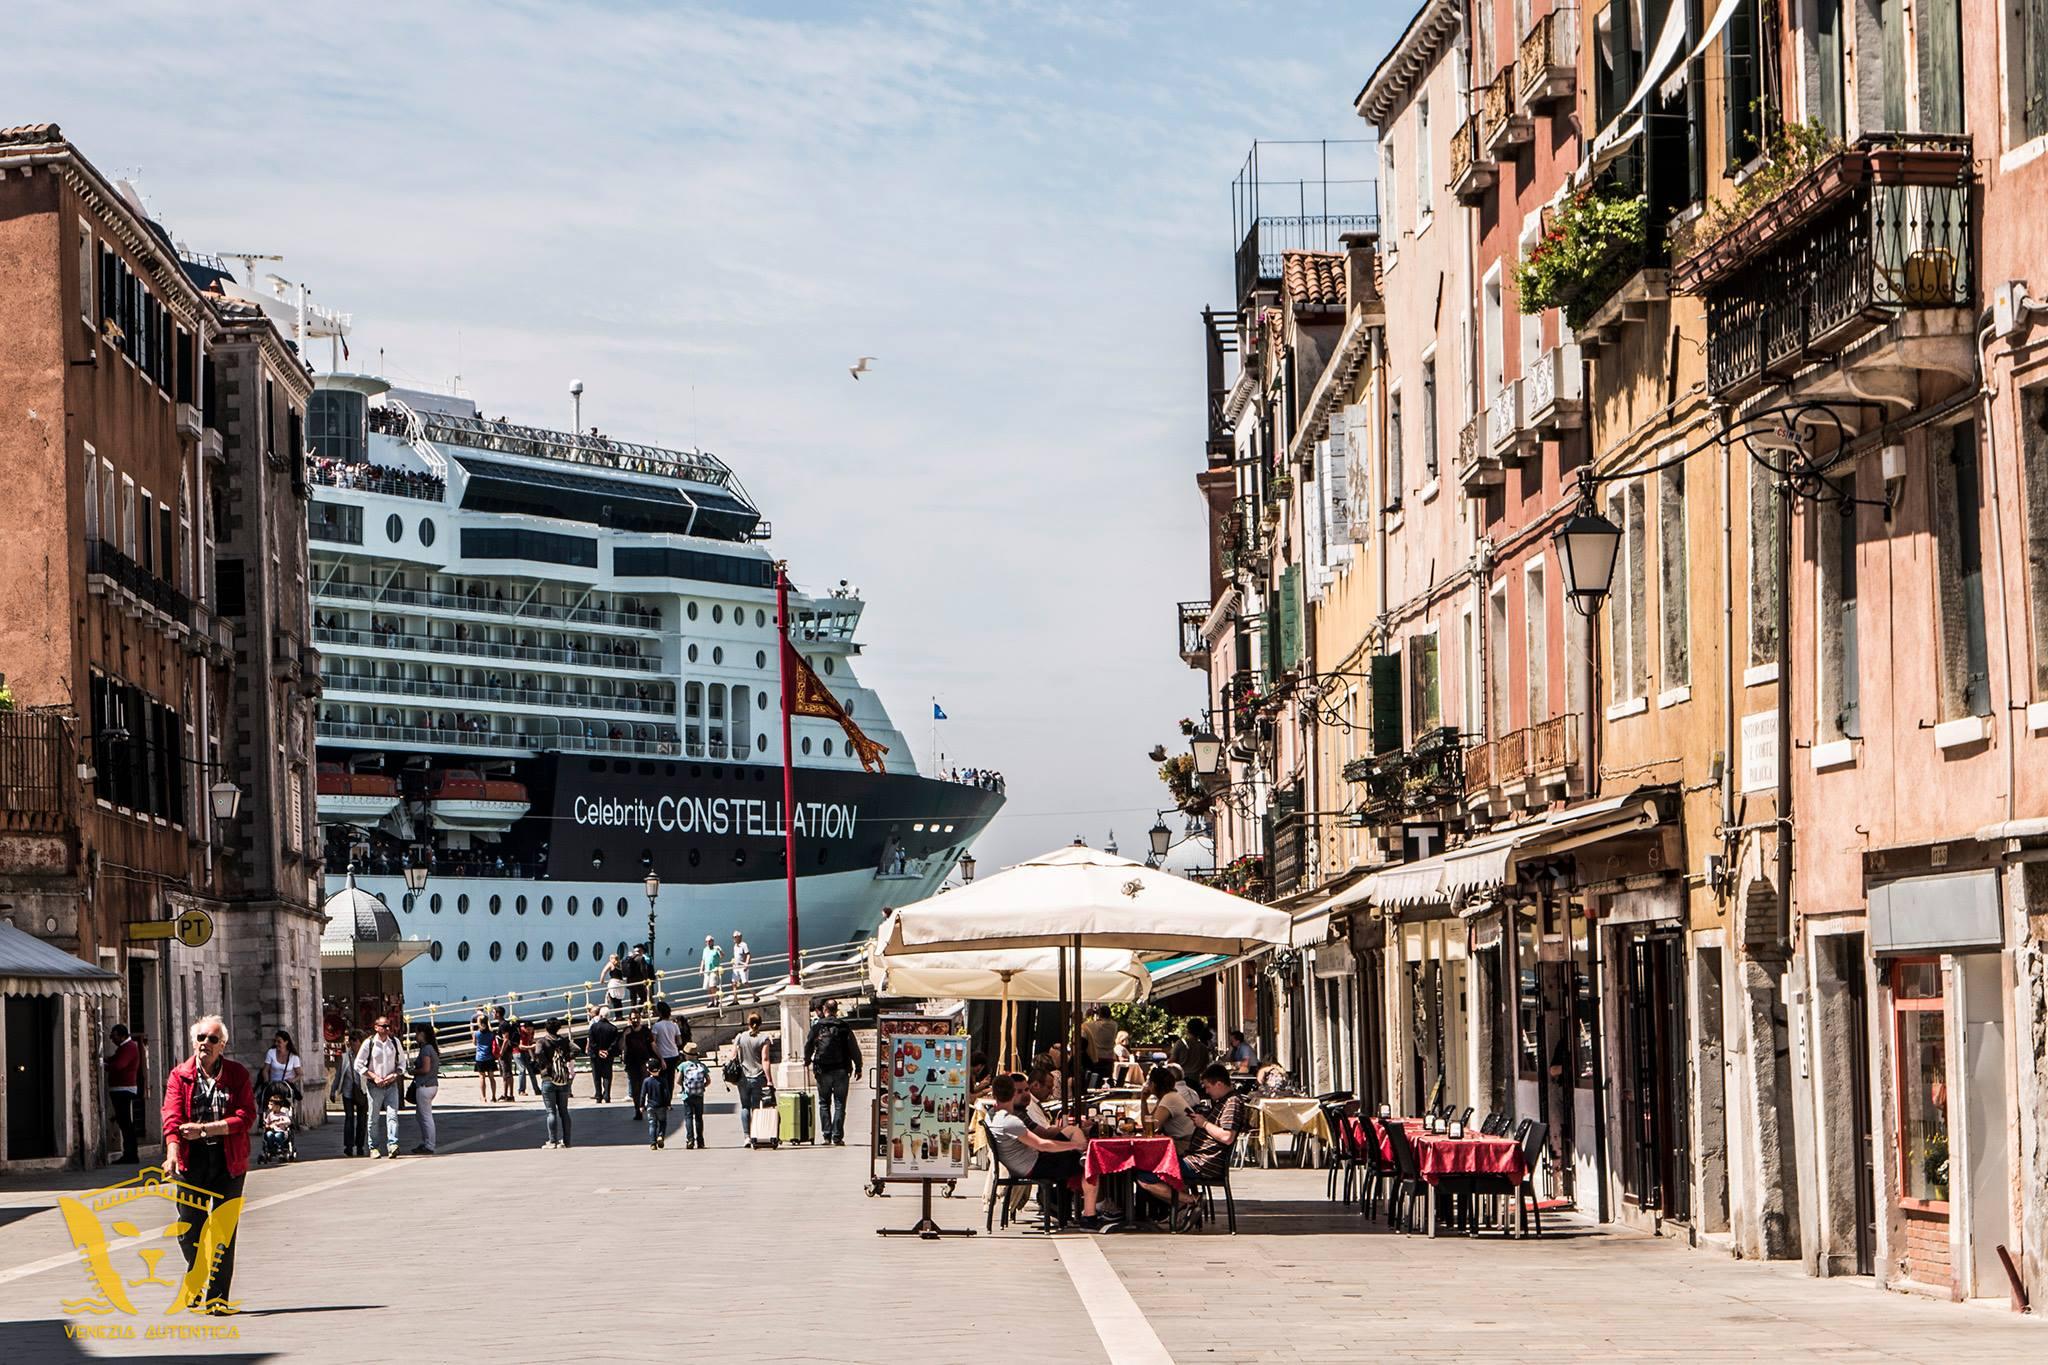 Cruise Ship seen from Via Garibaldi in Venice, Italy heading towards the Venice Cruise Terminal.